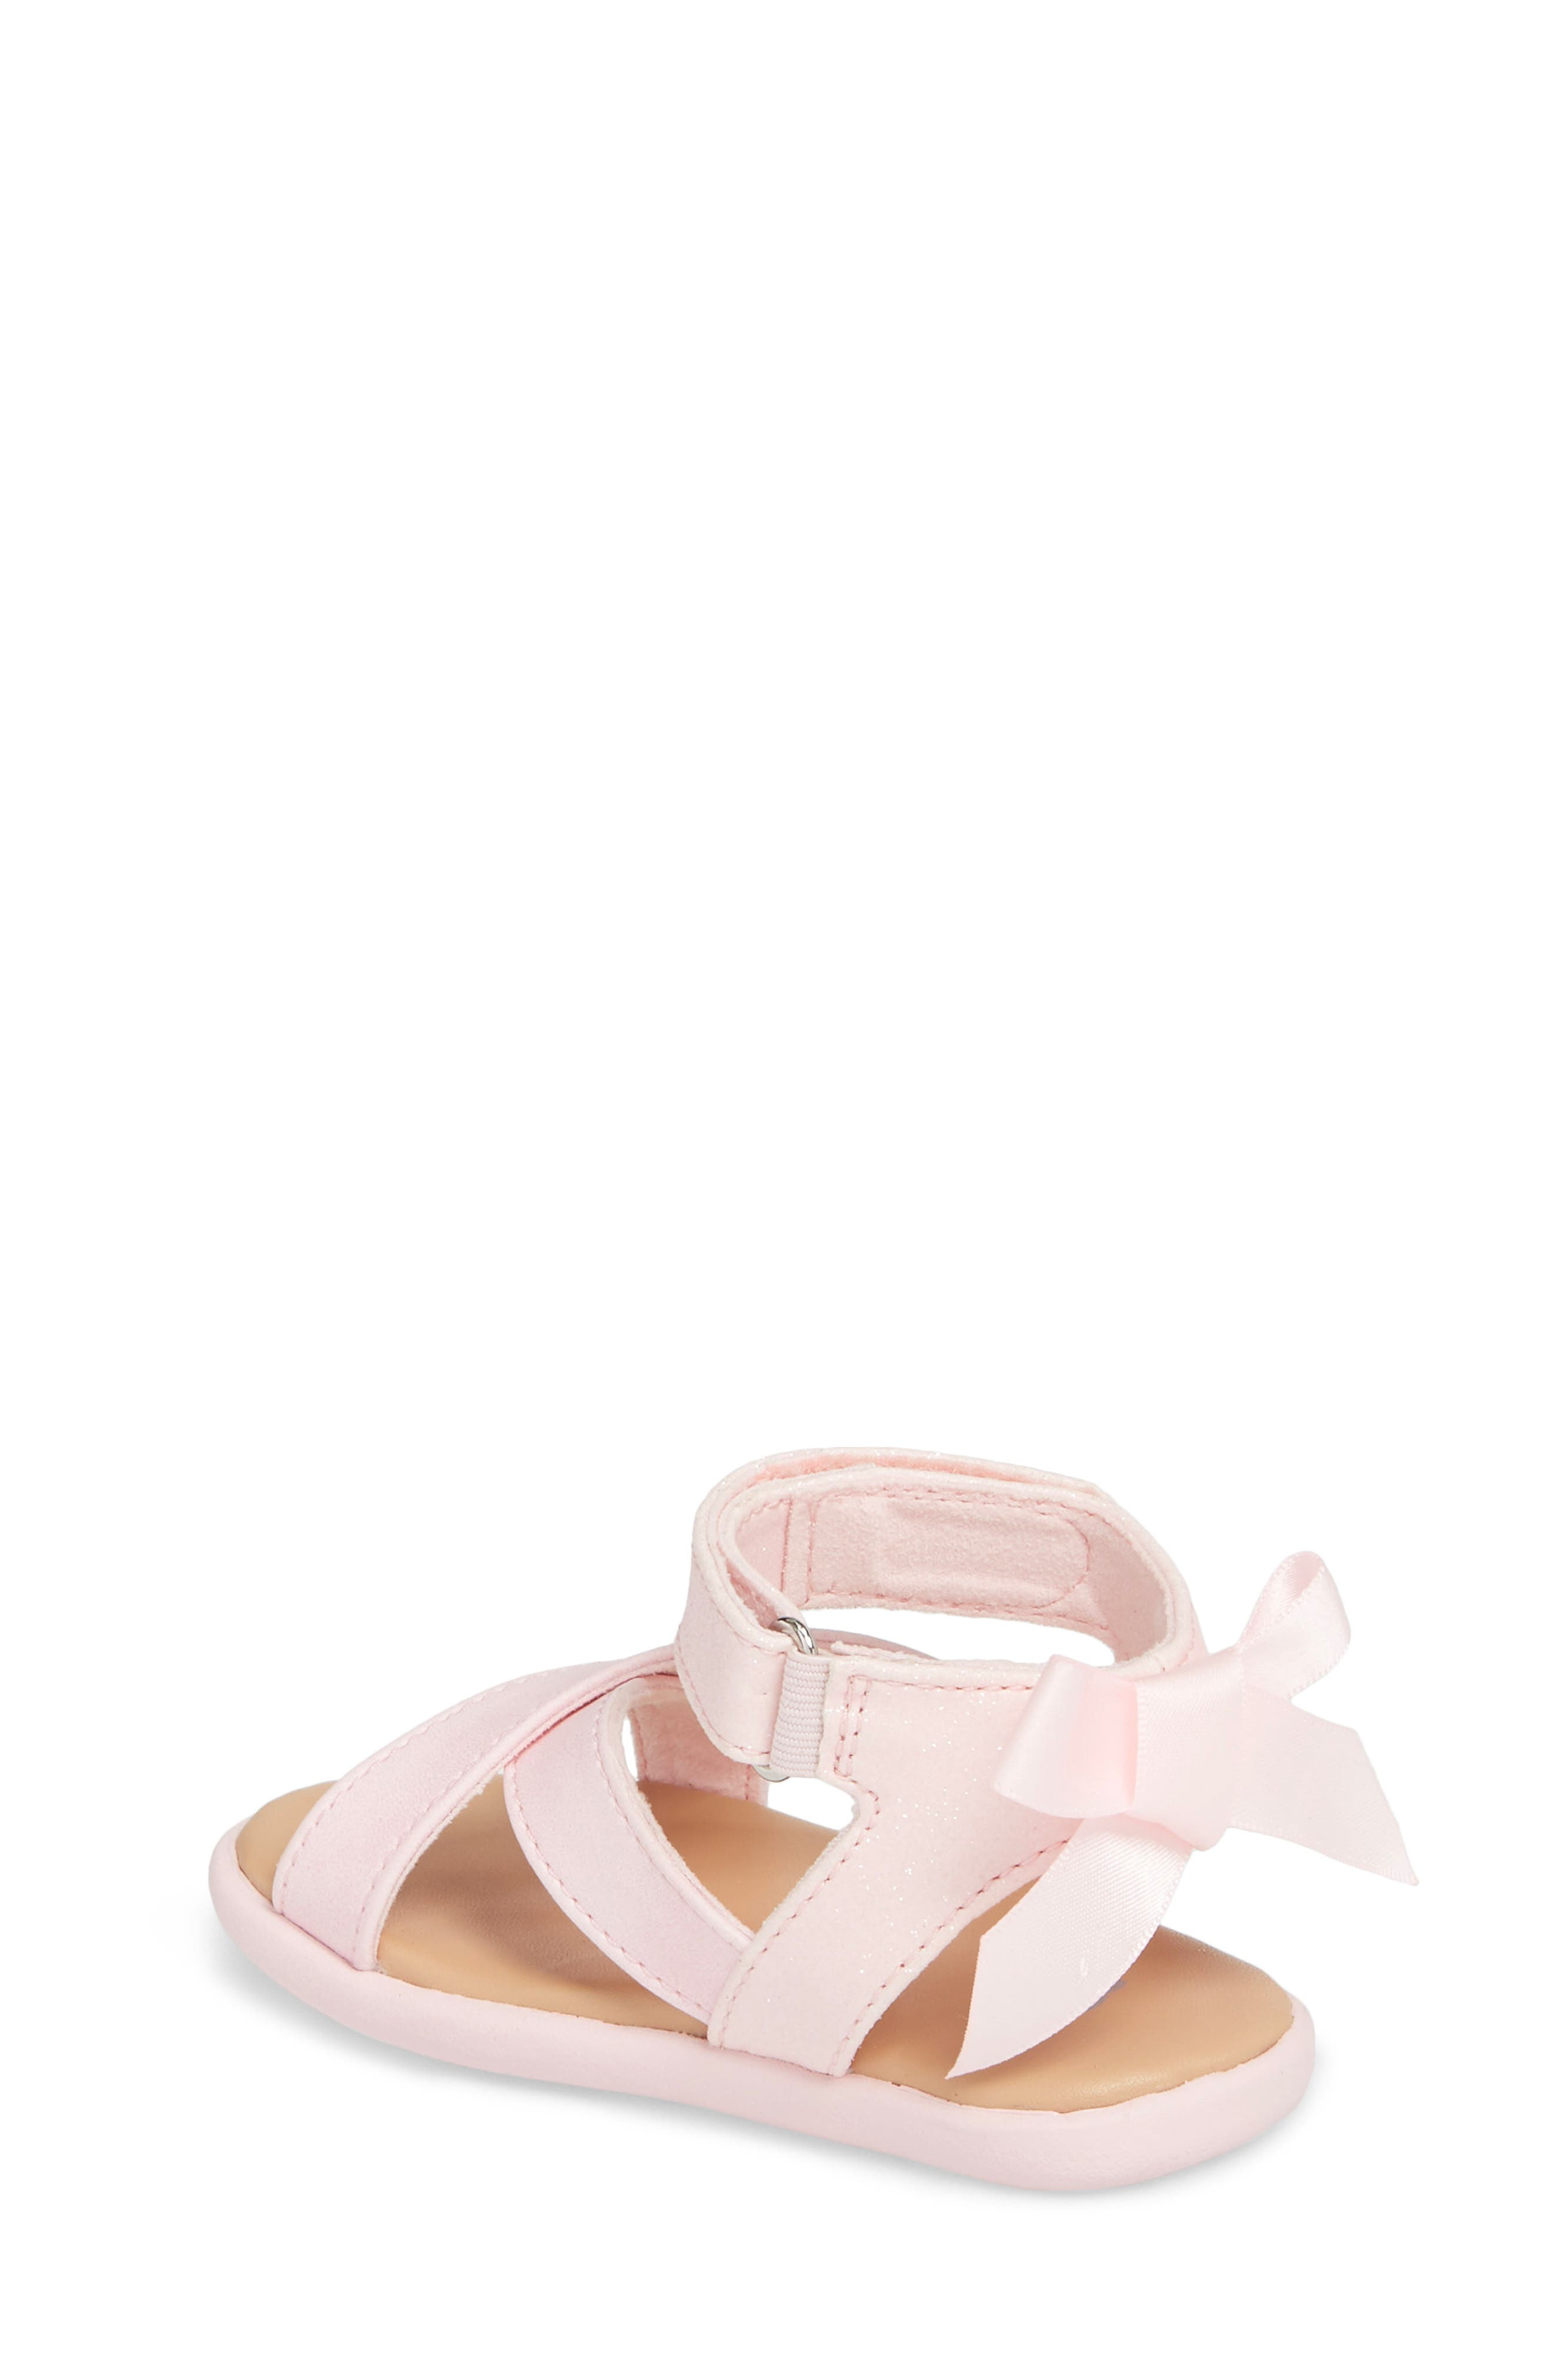 Maggiepie Sparkles Sandal,                             Alternate thumbnail 2, color,                             Seashell Pink